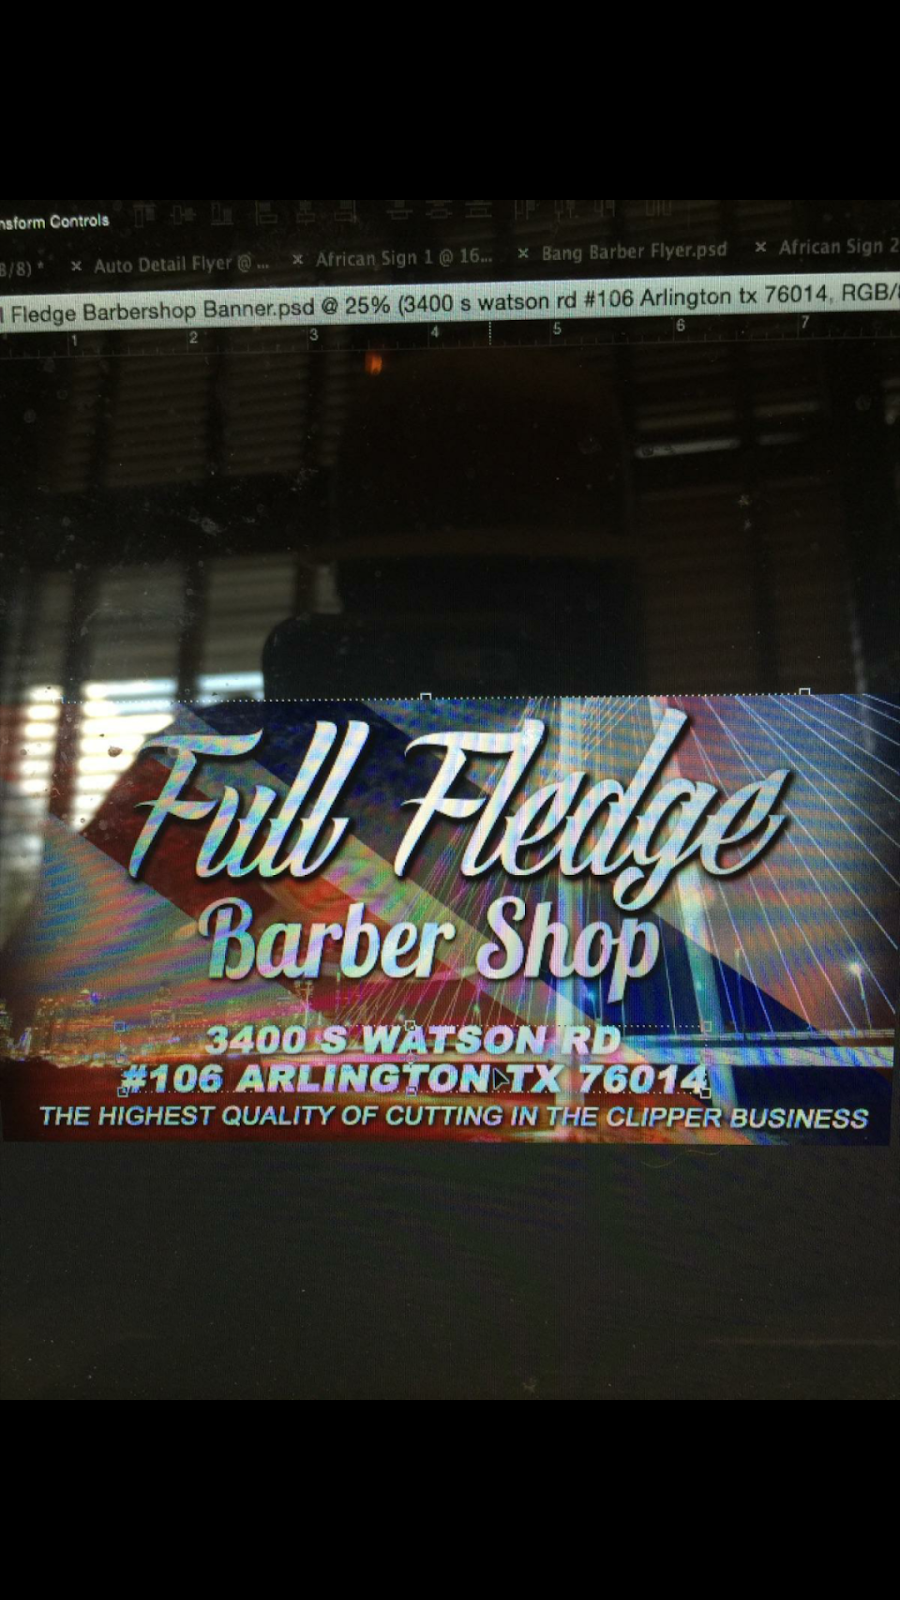 Full Fledge Barber & Beauty Salon - hair care  | Photo 10 of 10 | Address: 3400 S Watson Rd #106, Arlington, TX 76014, USA | Phone: (972) 639-2258